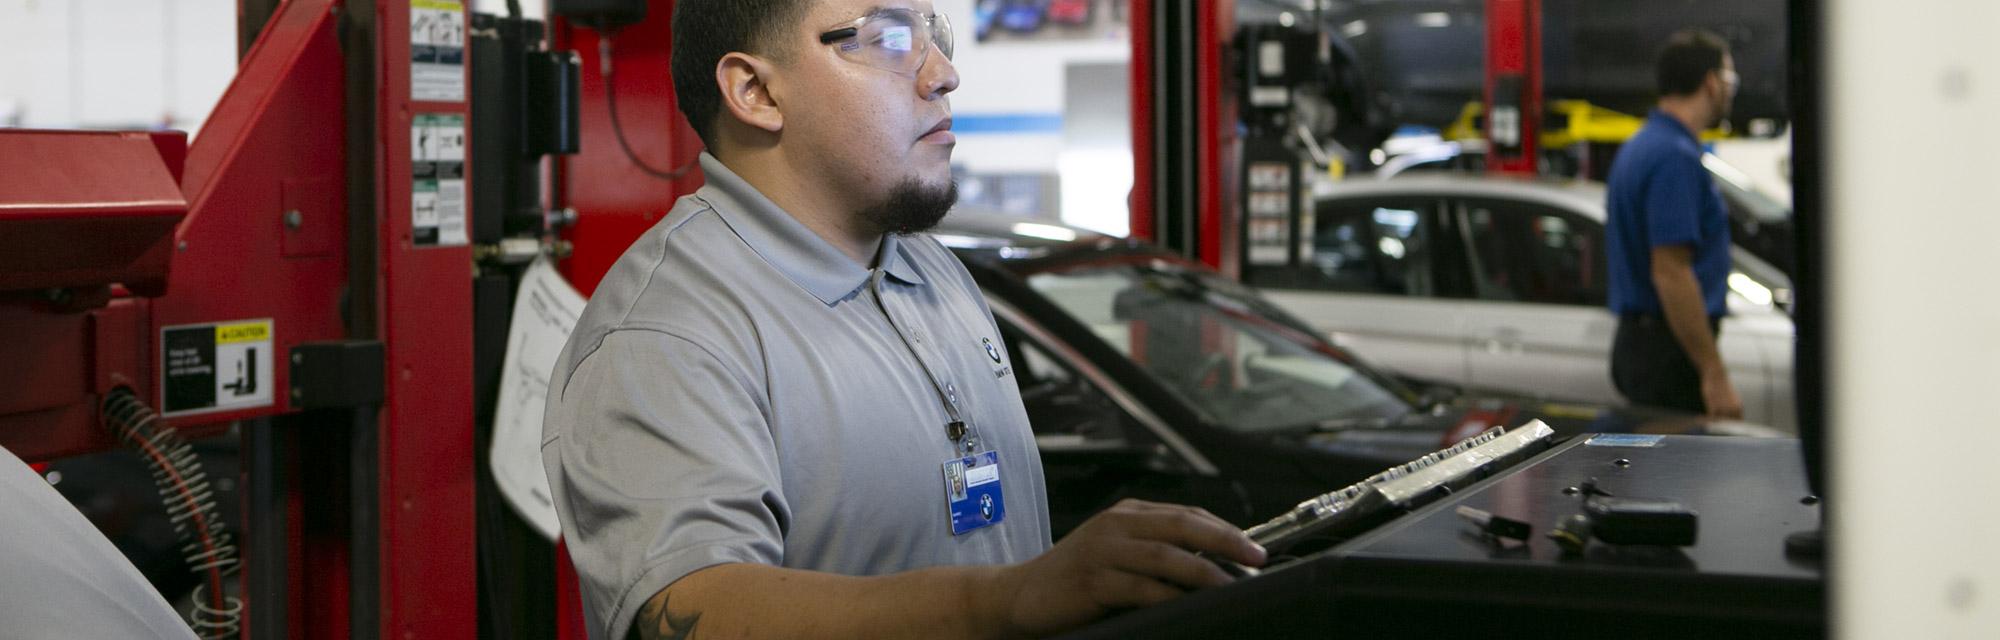 Auto Mechanic Student Monitoring Car Diagnostics